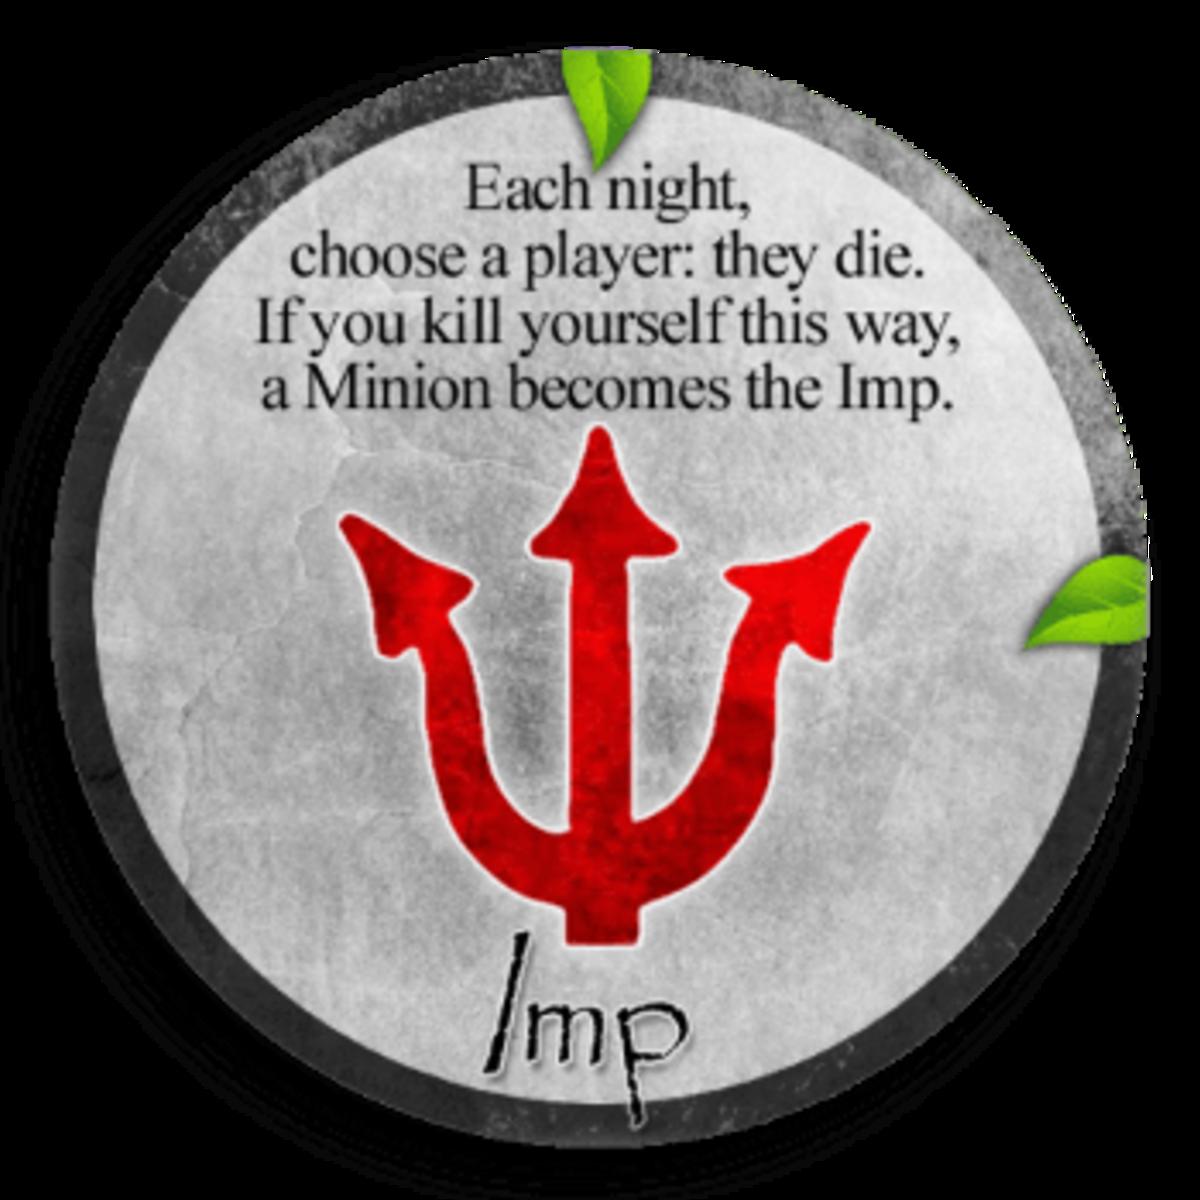 Clocktower's evil imp